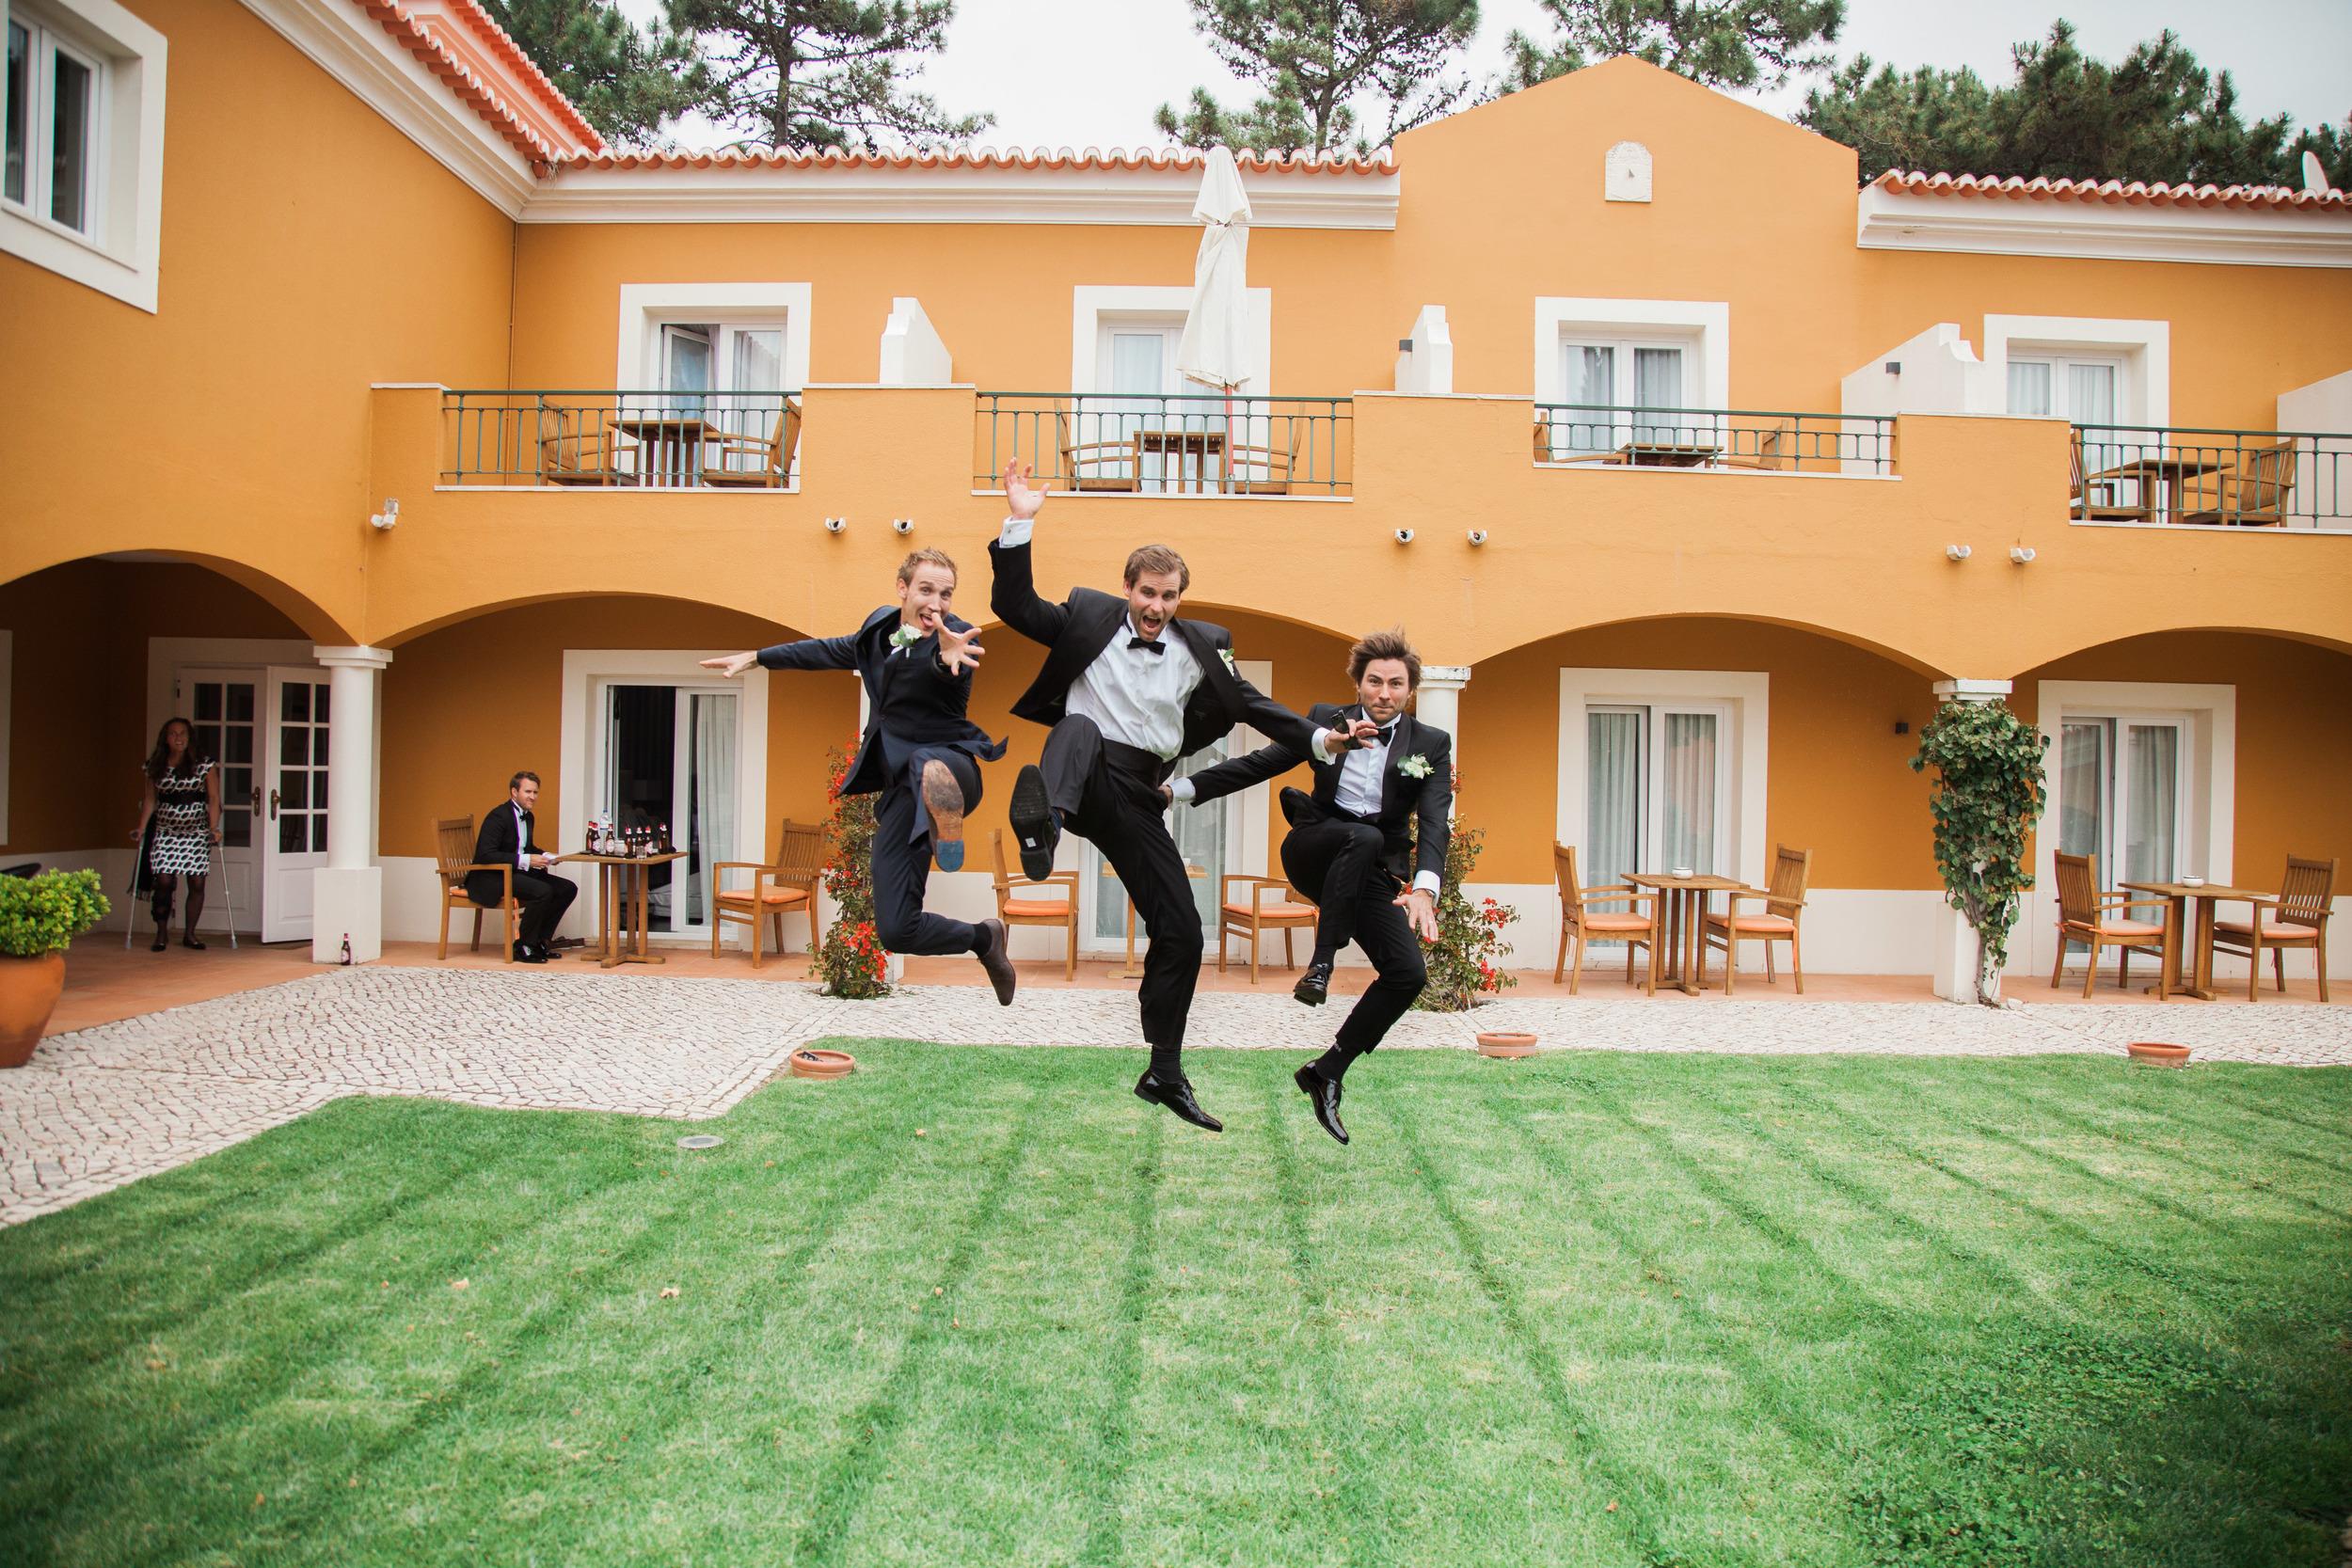 mariarao+wedding+portugal+cascais-64.jpg